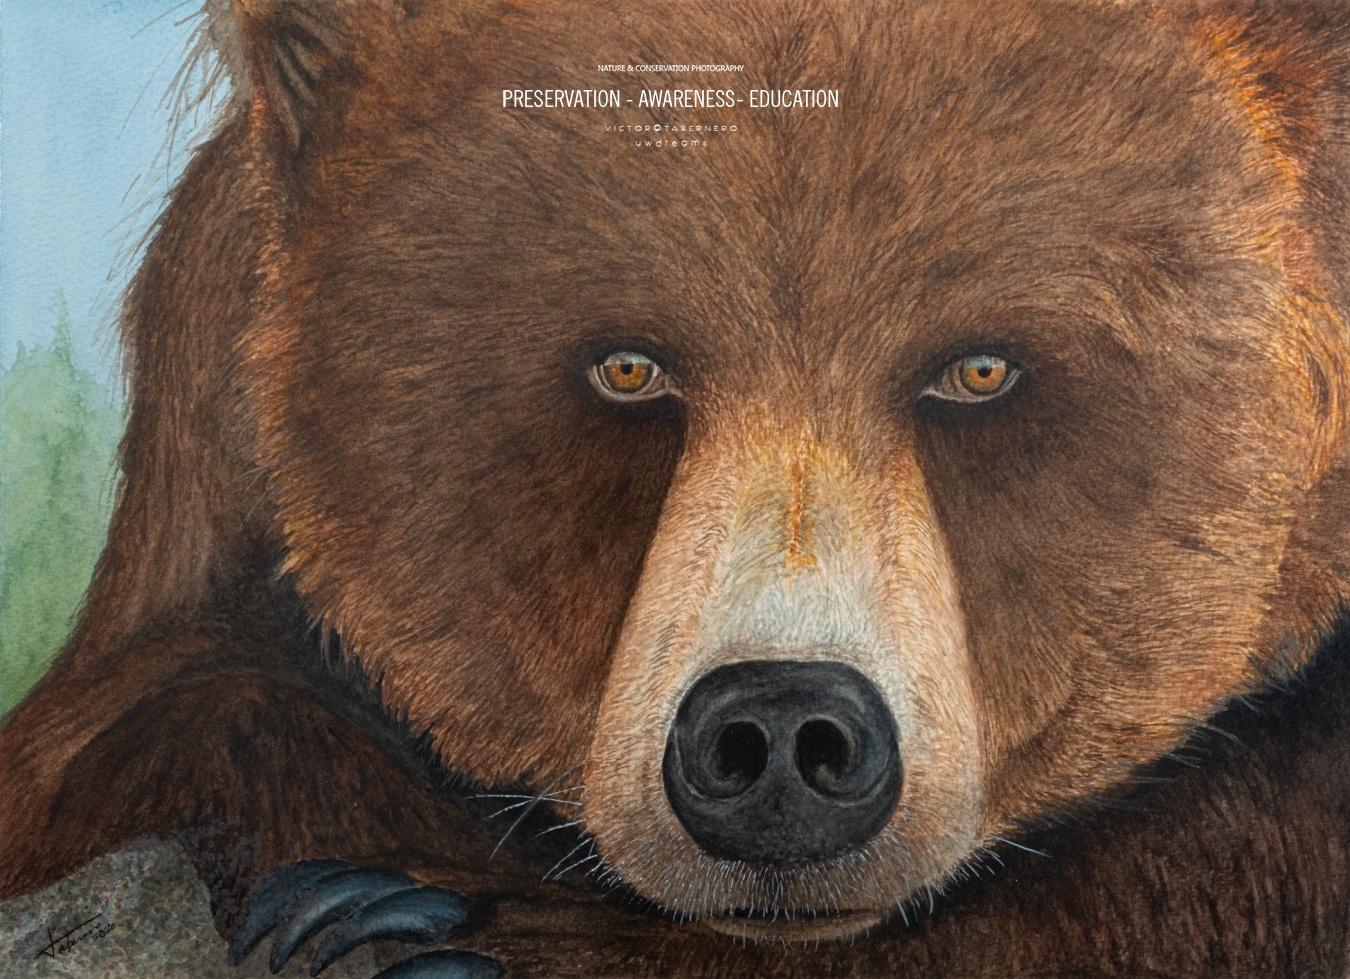 Grizzly - 41x31cm - Vida Salvaje - Wildlife Conservation Photography, UWDREAMS.COM